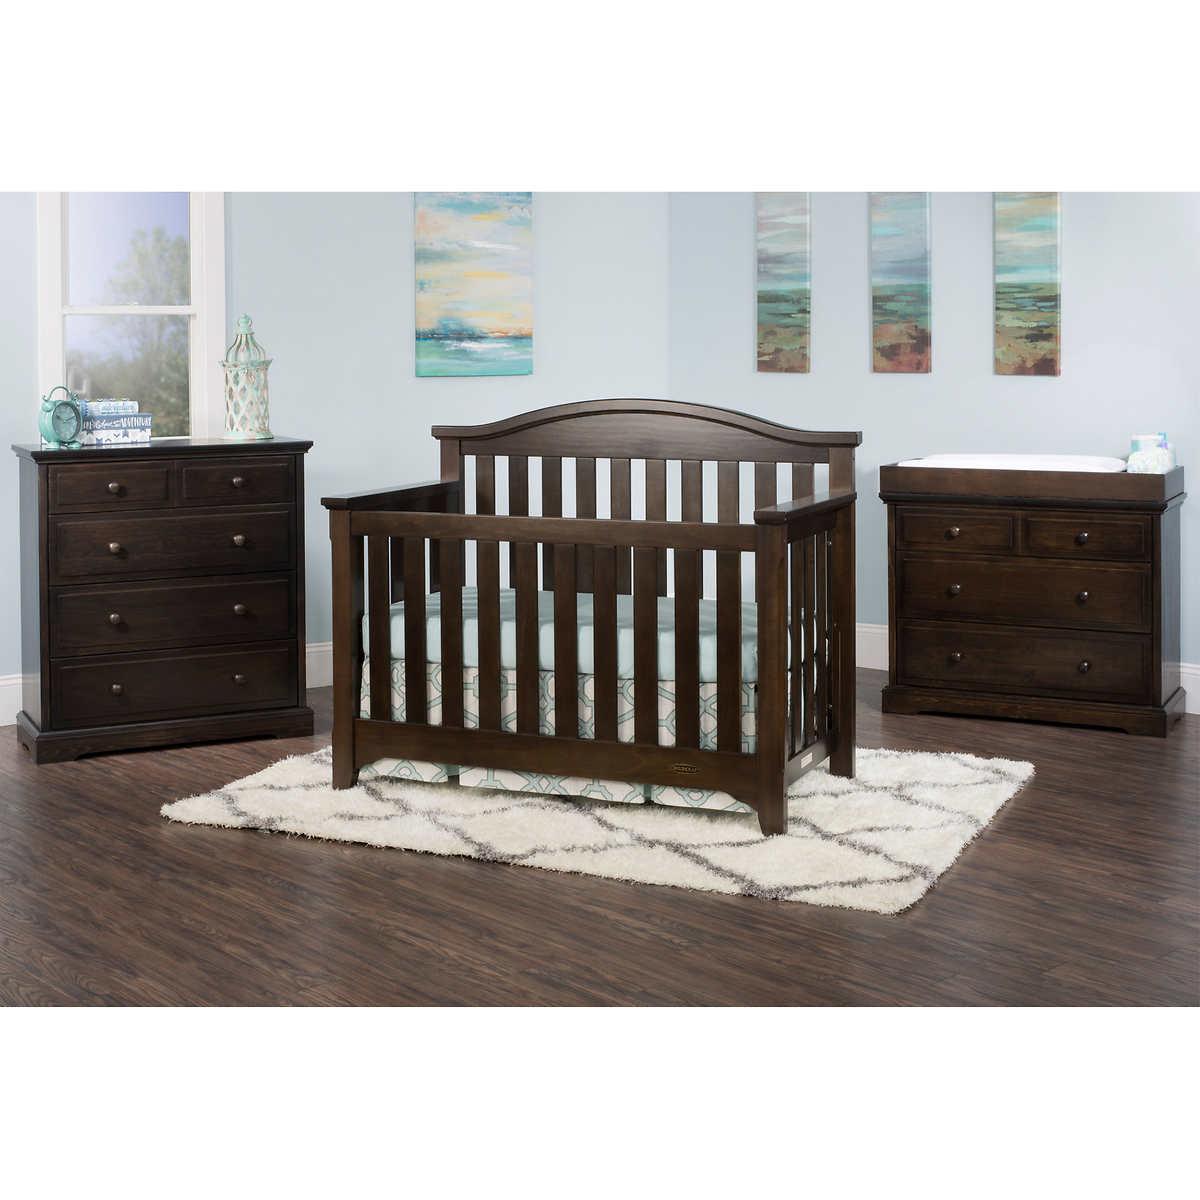 Baby cribs buy buy baby - Paisley 3 Piece Convertible Crib Set